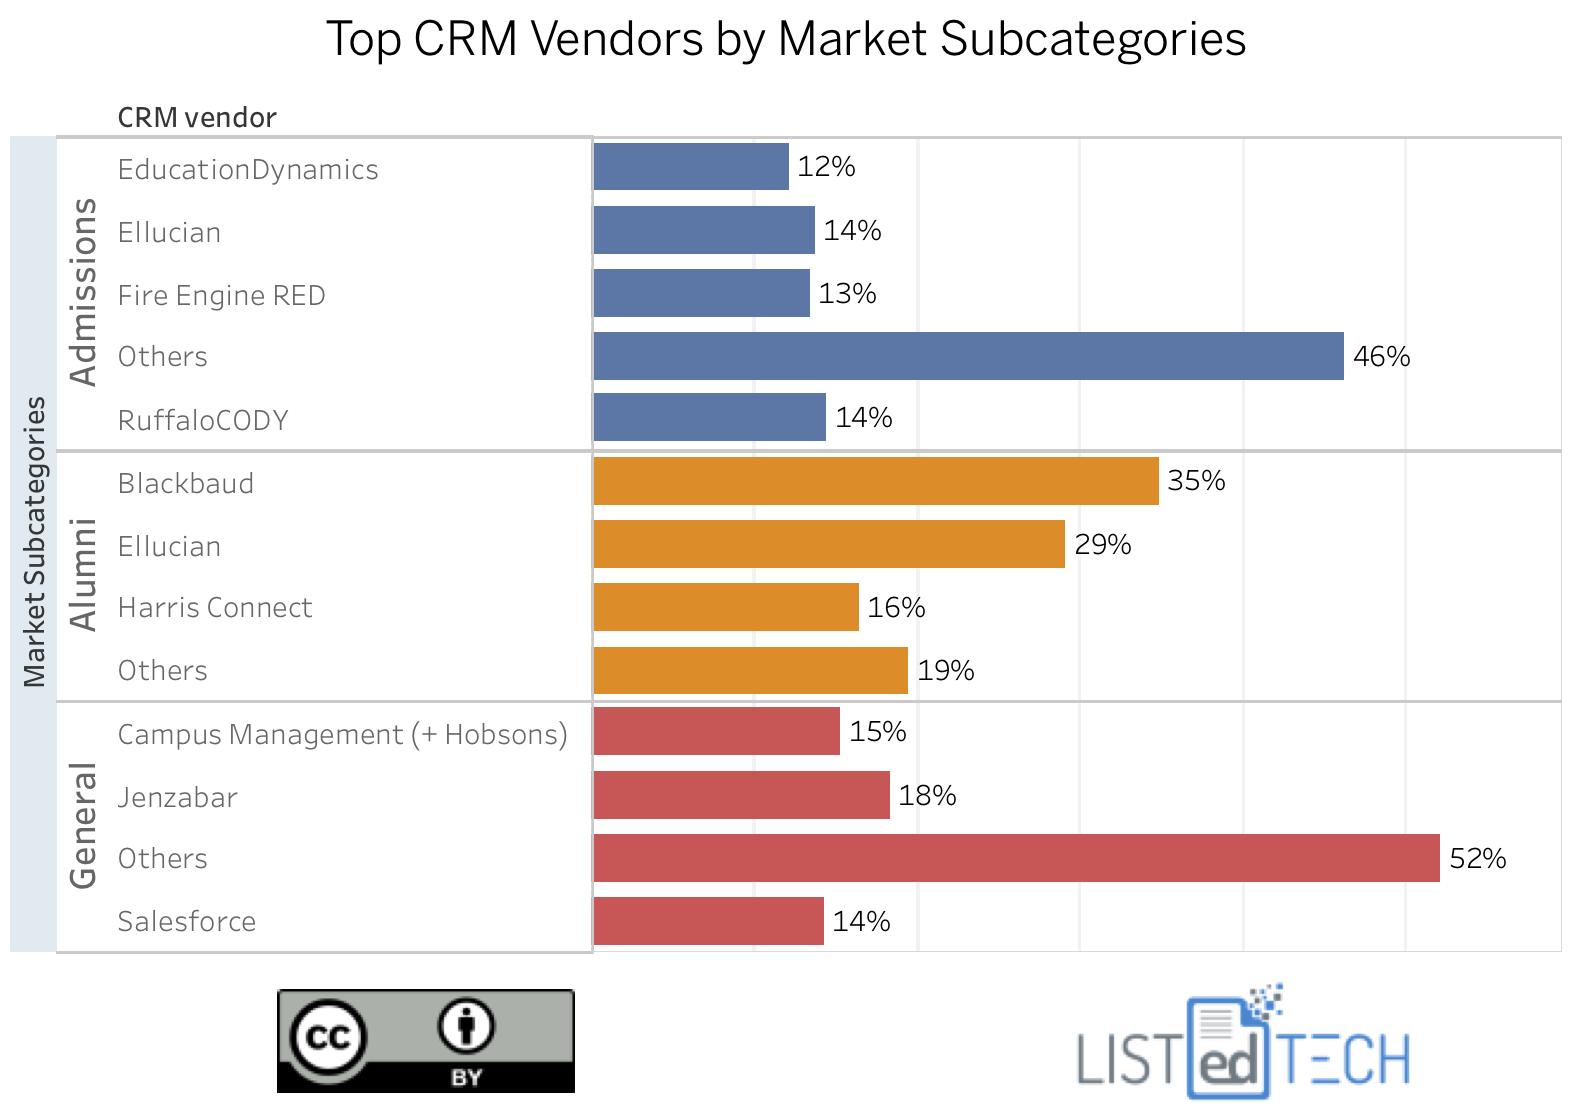 Top CRM Vendors by Market Subcategories - LisTedTECH